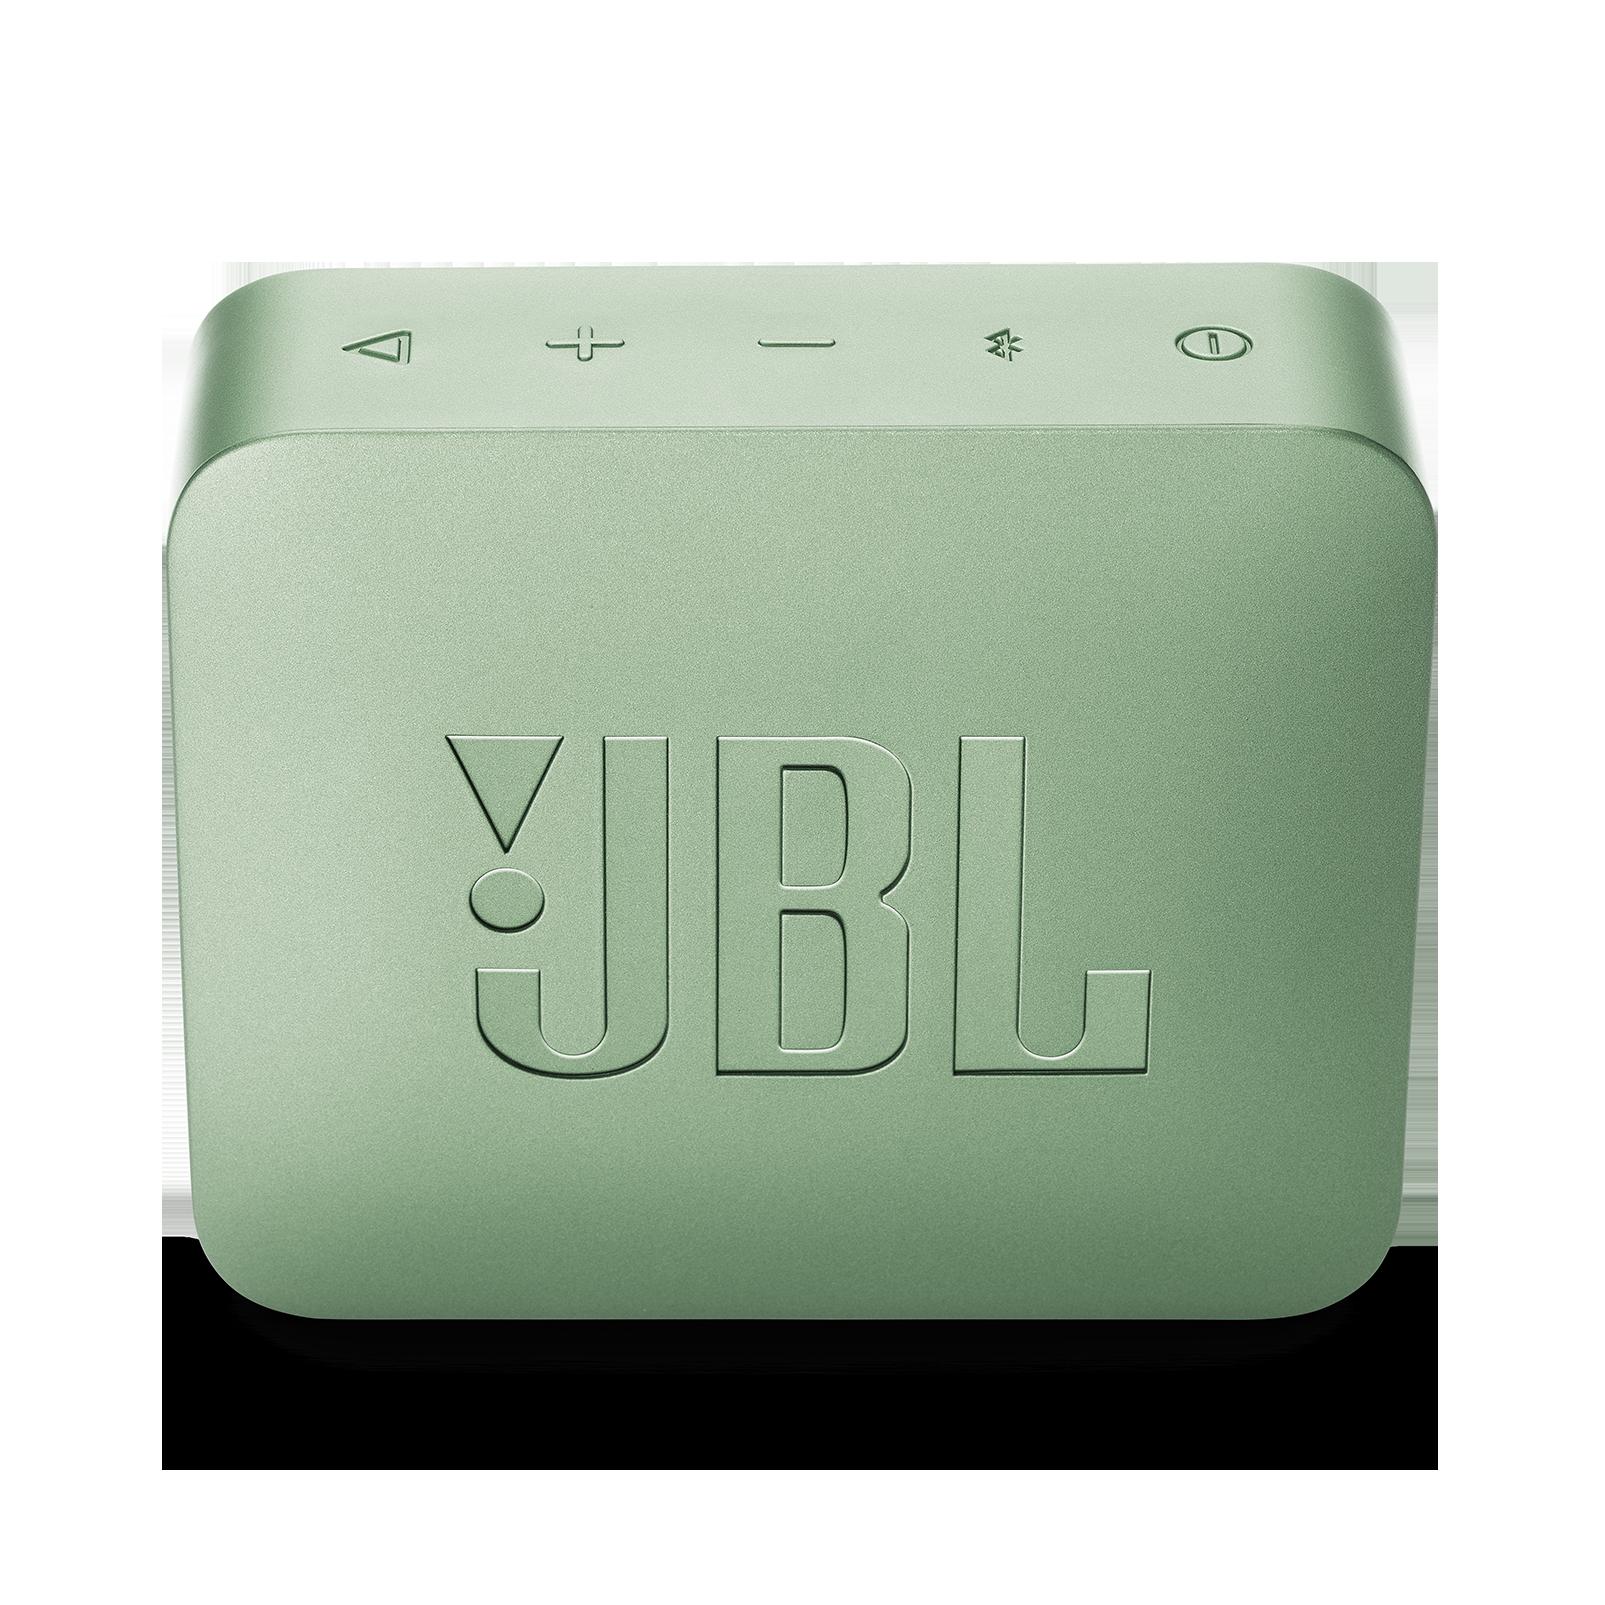 JBL GO 2 - Seafoam Mint - Portable Bluetooth speaker - Back